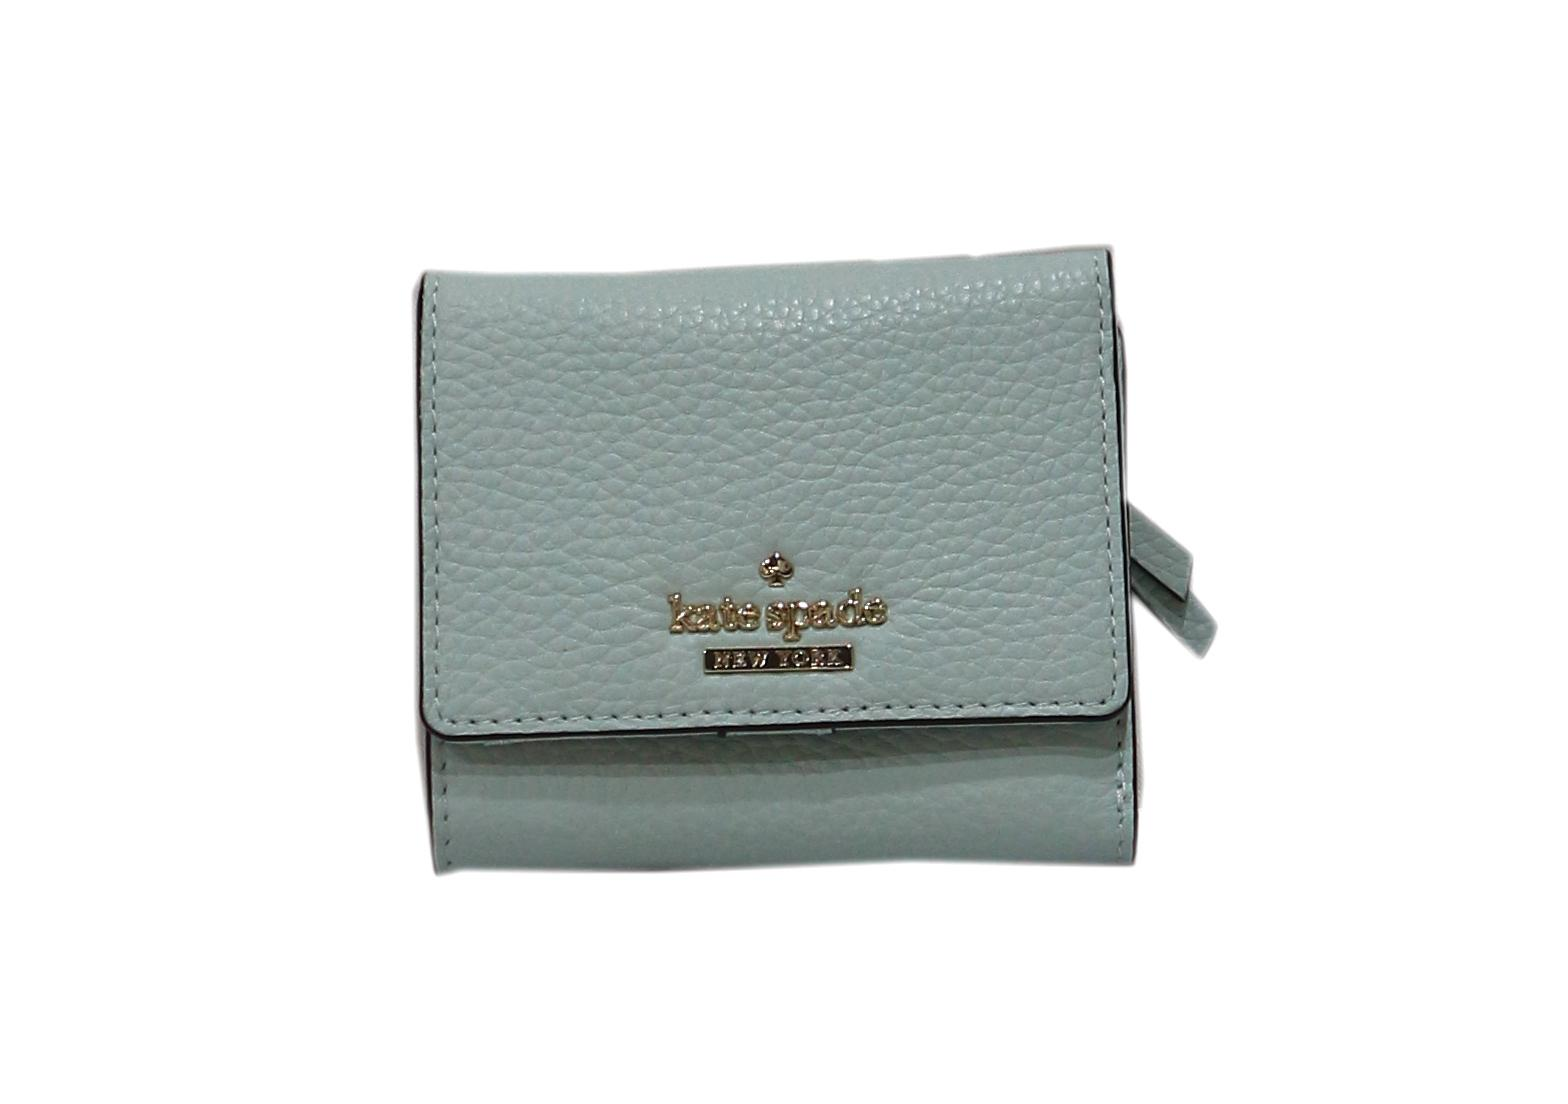 hot sale online 167b2 f7f75 [中古]Kate Spade(ケイトスペード)のレディース 服飾小物 2つ折り財布